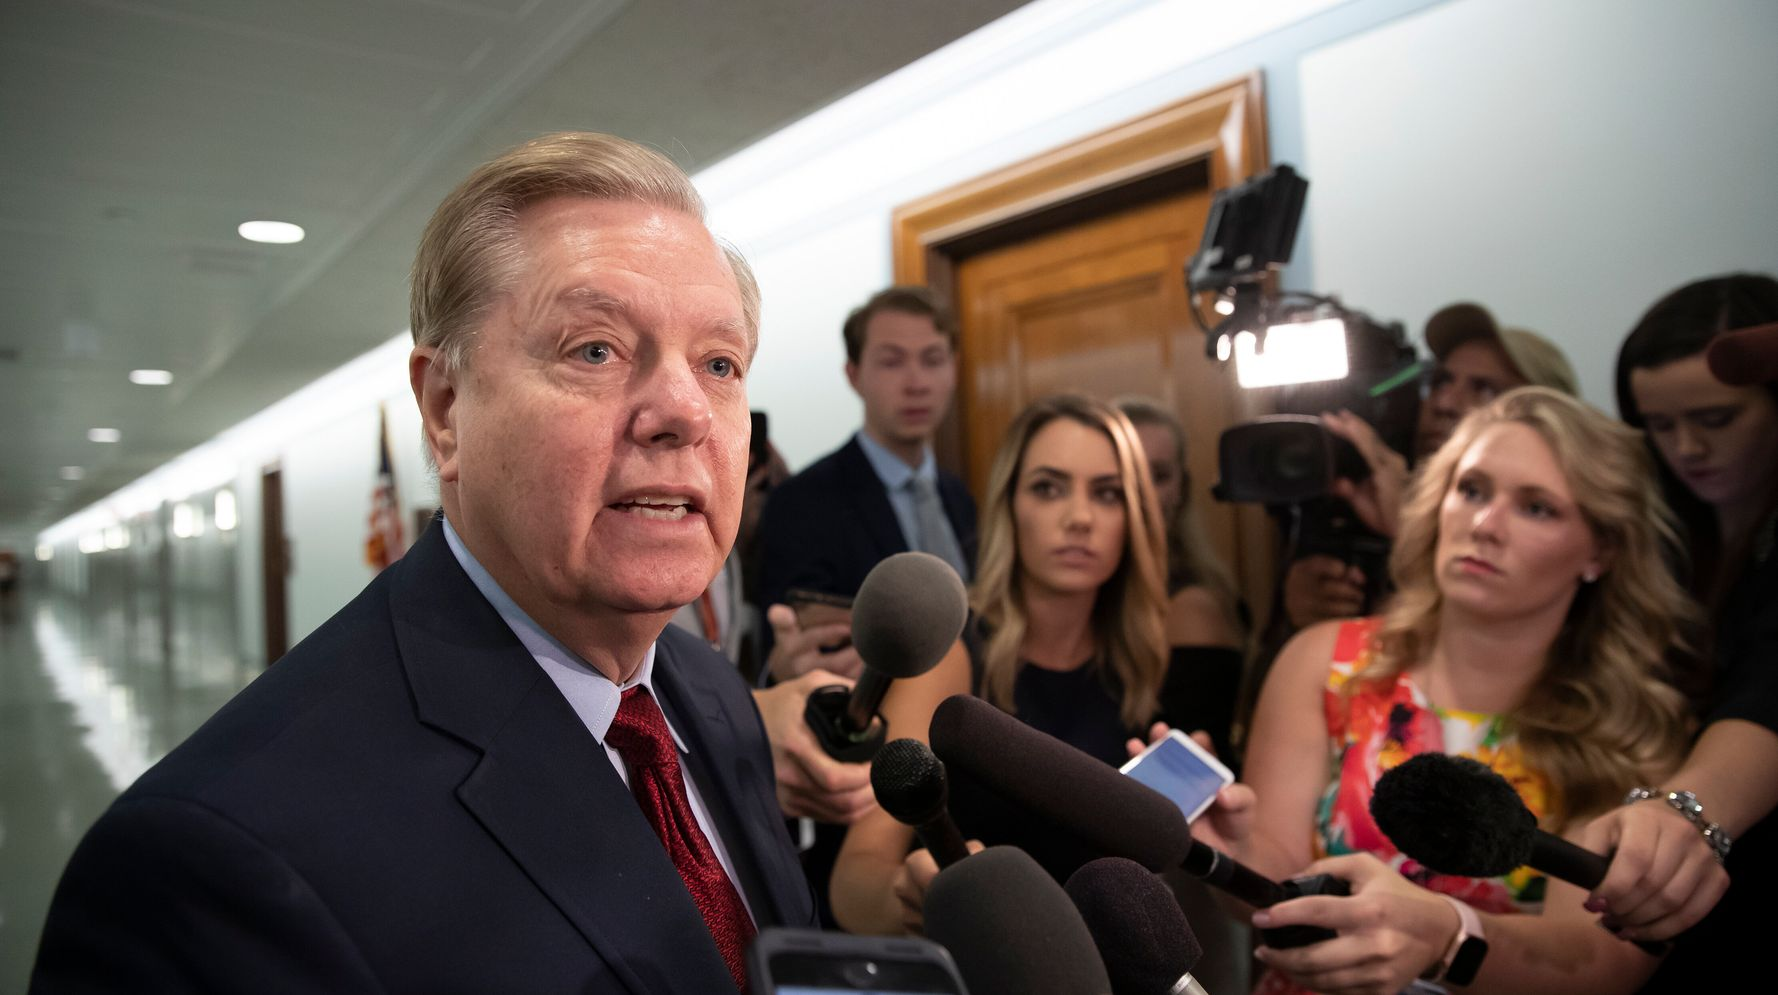 Westlake Legal Group 5d9b460c2000004e004ebc75 Republicans, Foreign Policy Experts Condemn Trump's Decision To Abandon Kurds